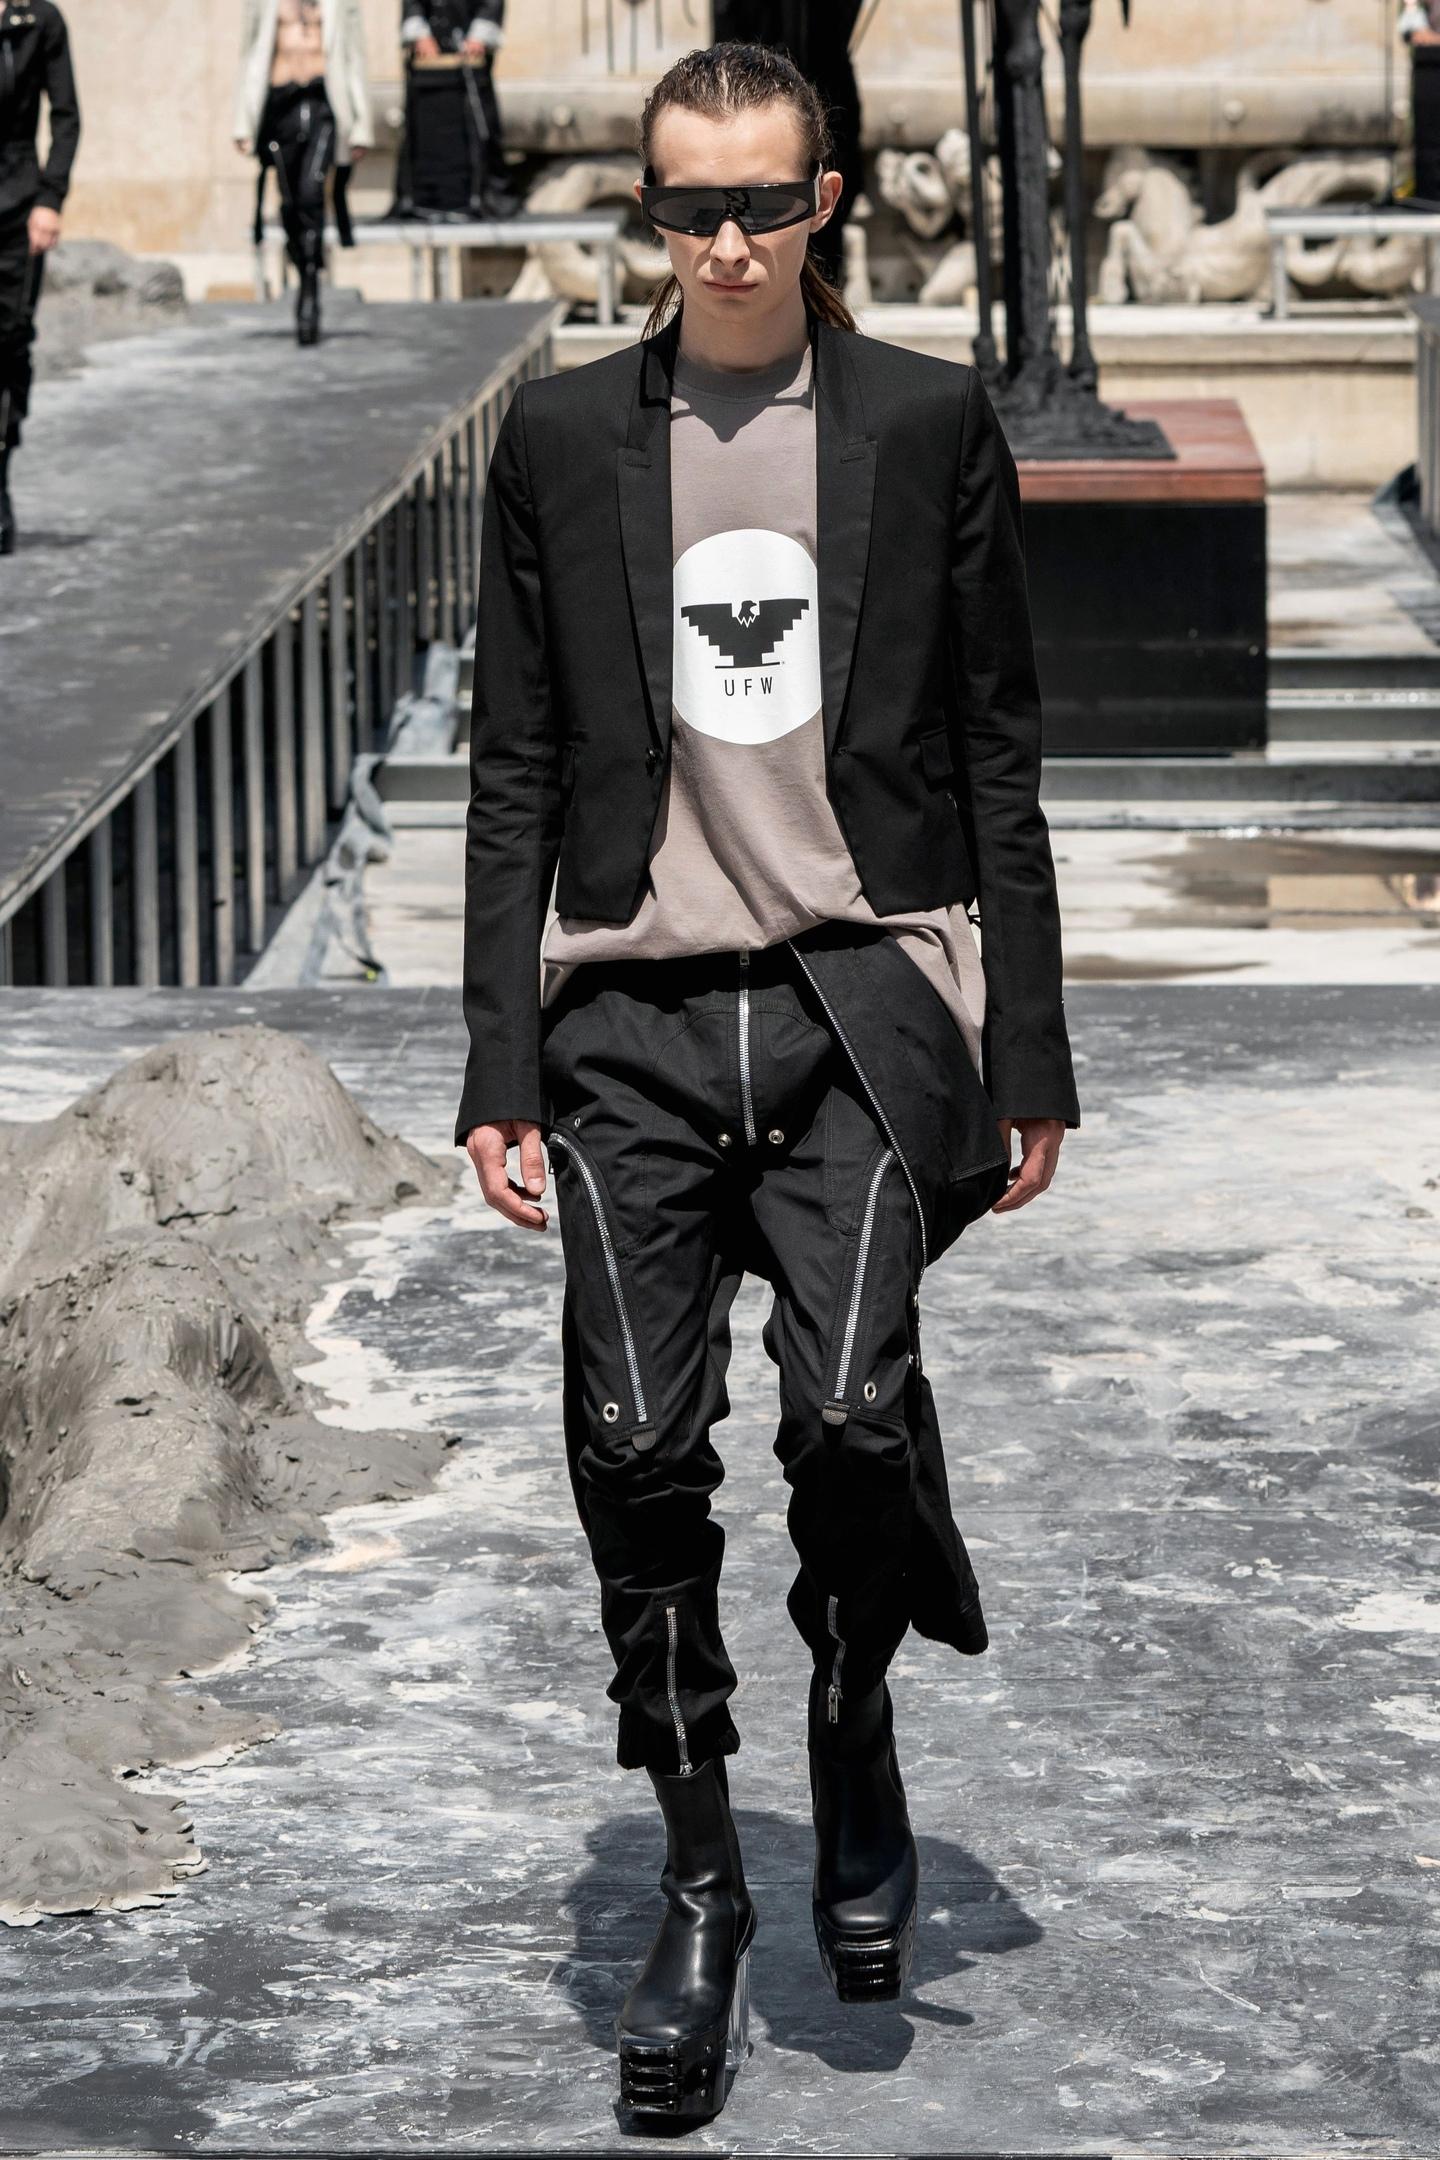 Rick Owens Spring/Summer 2020 Menswear